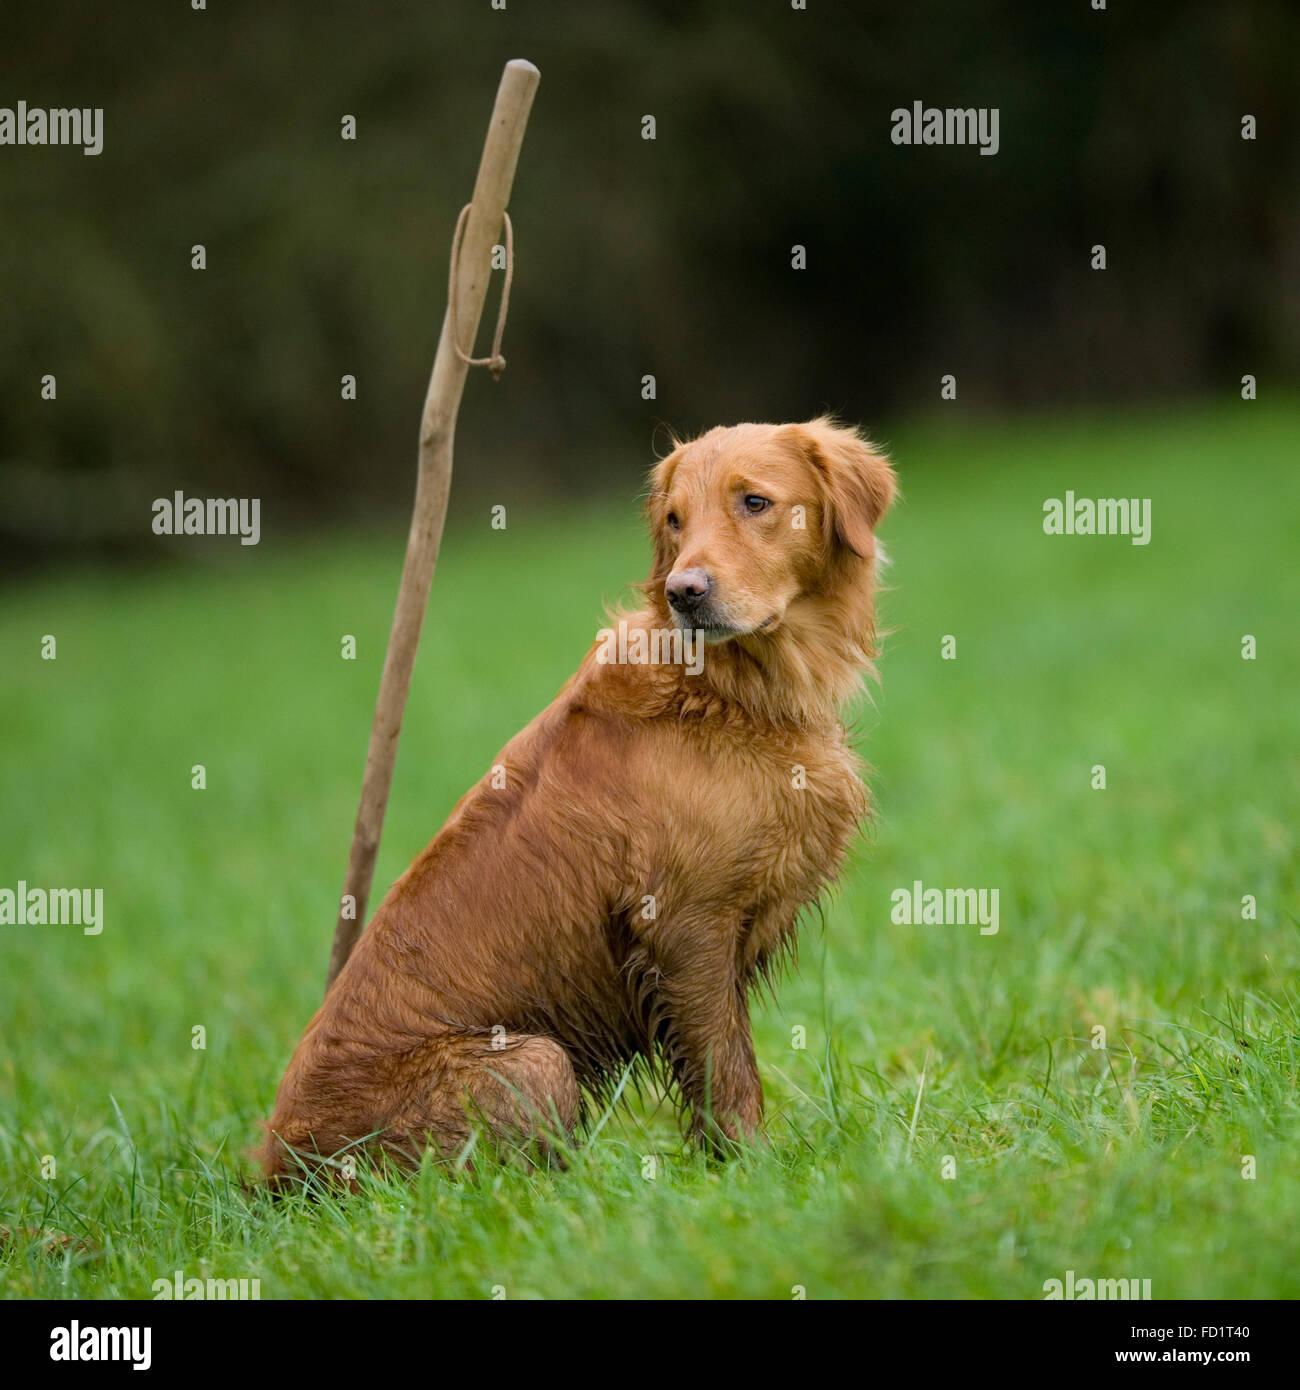 golden retriever on a peg - Stock Image